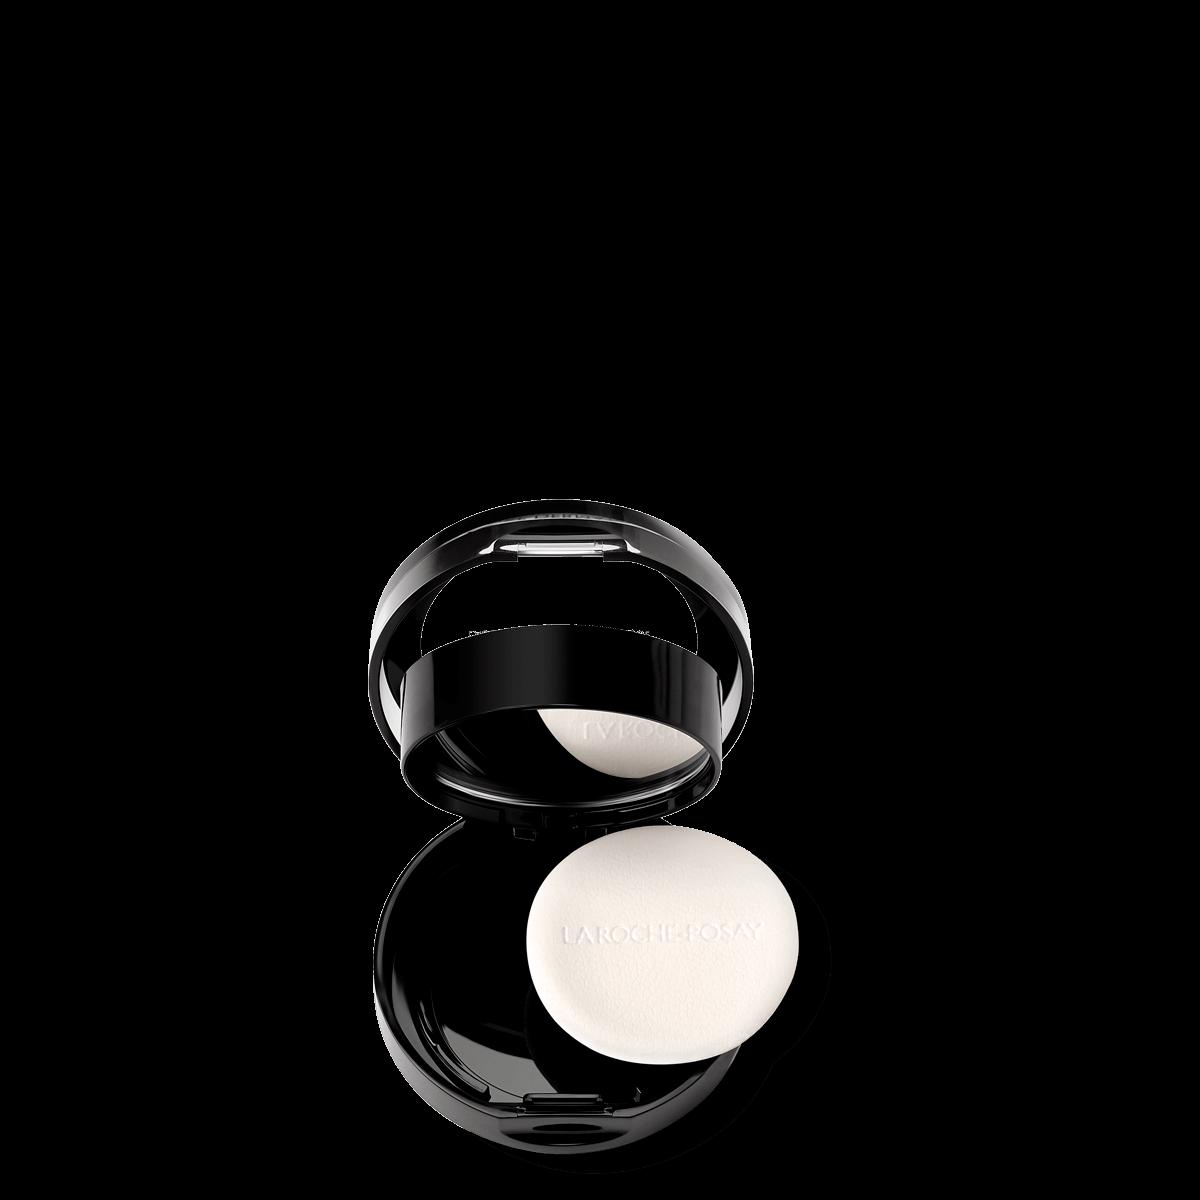 La Roche Posay Sensitive Toleriane Make up BLUSH_GoldenPink 30102415 O